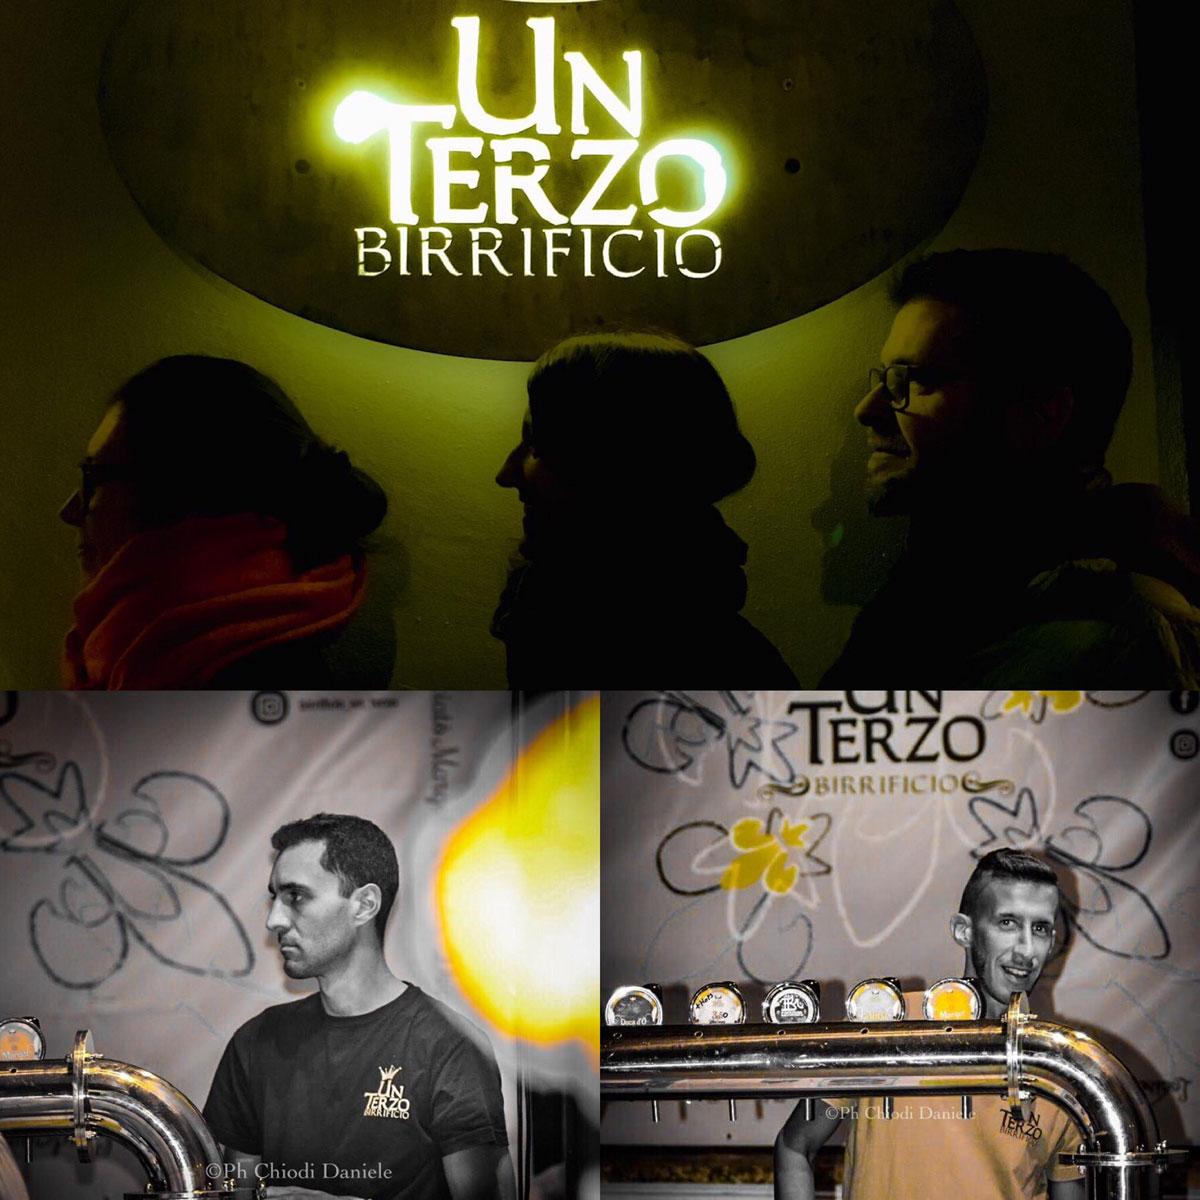 birrificio-un-terzo-04